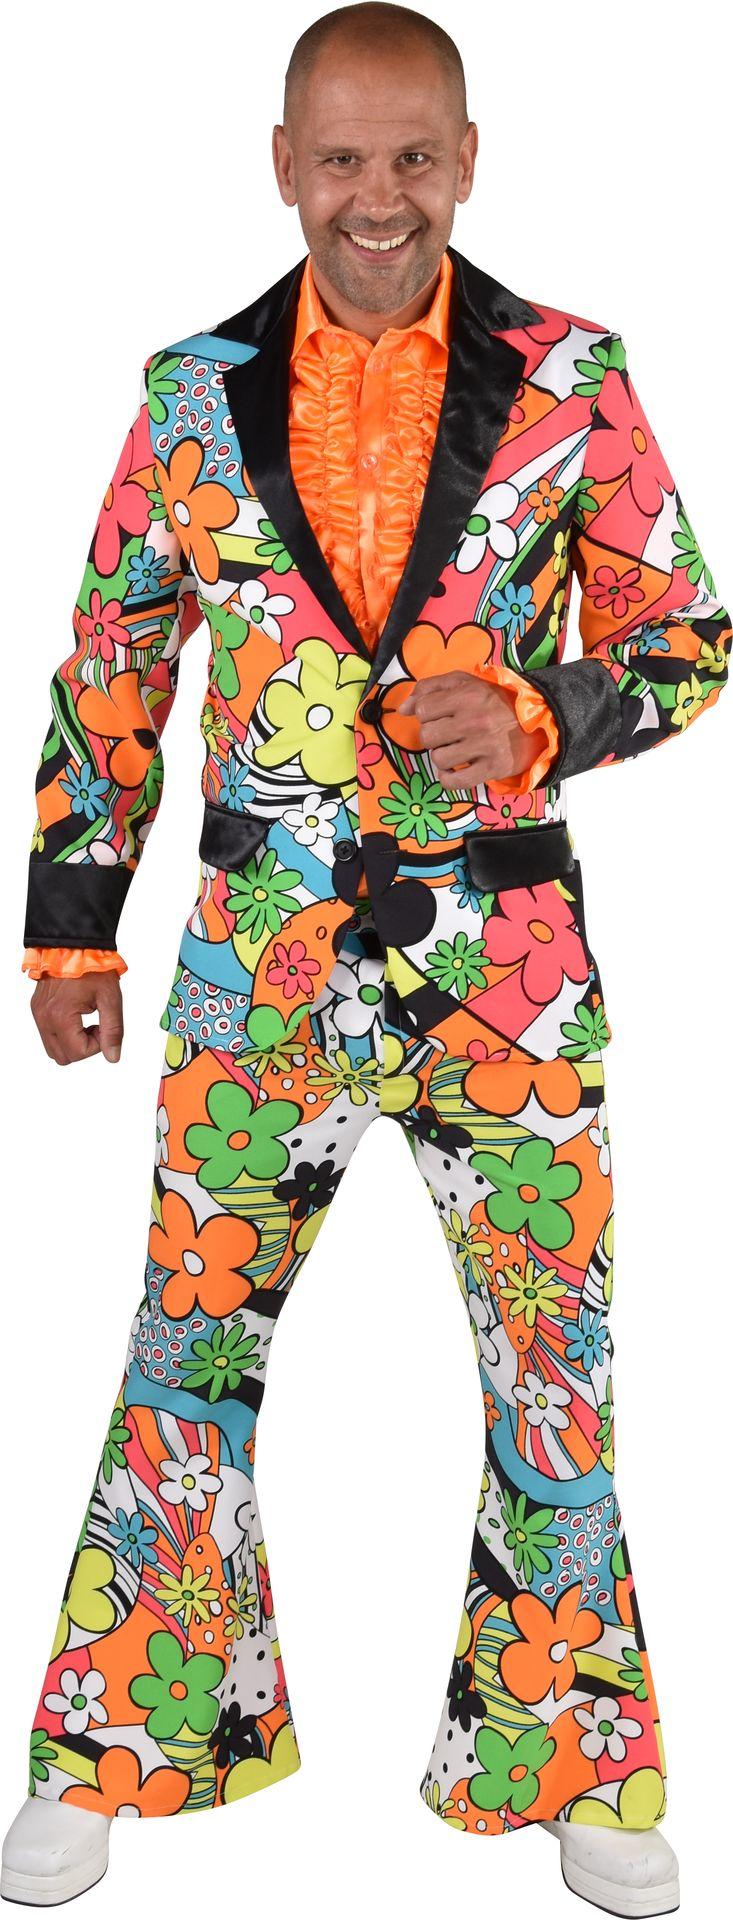 Woodstock outfit heren